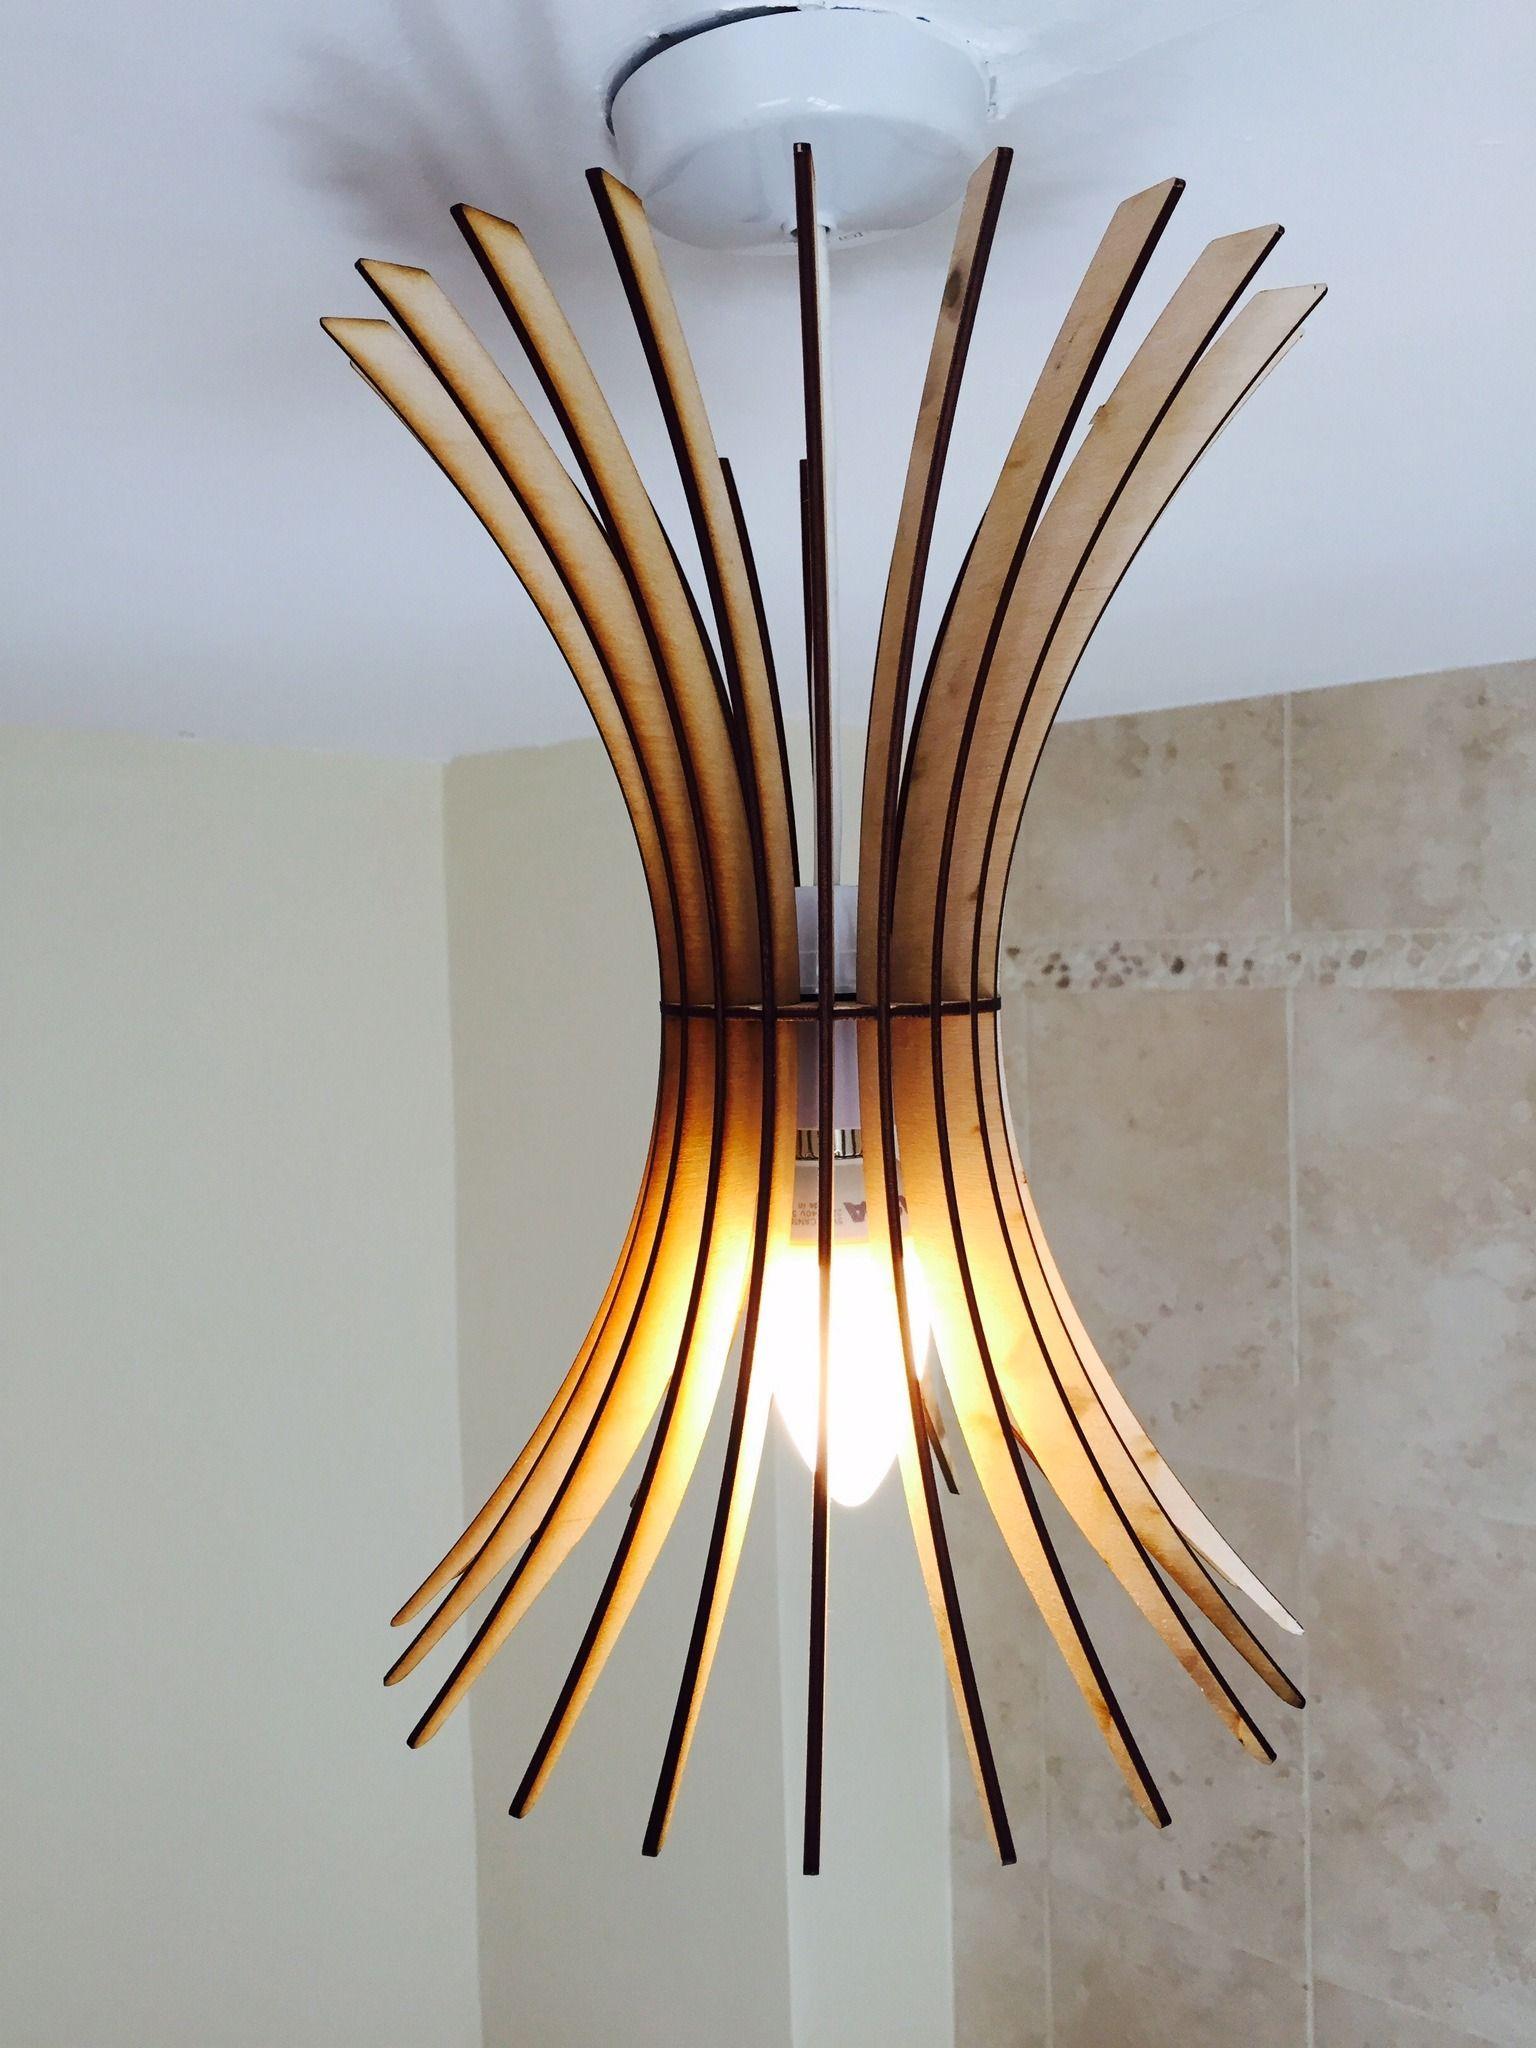 Burst Design Laser Cut Wooden Hanging Lamp Shade Dining